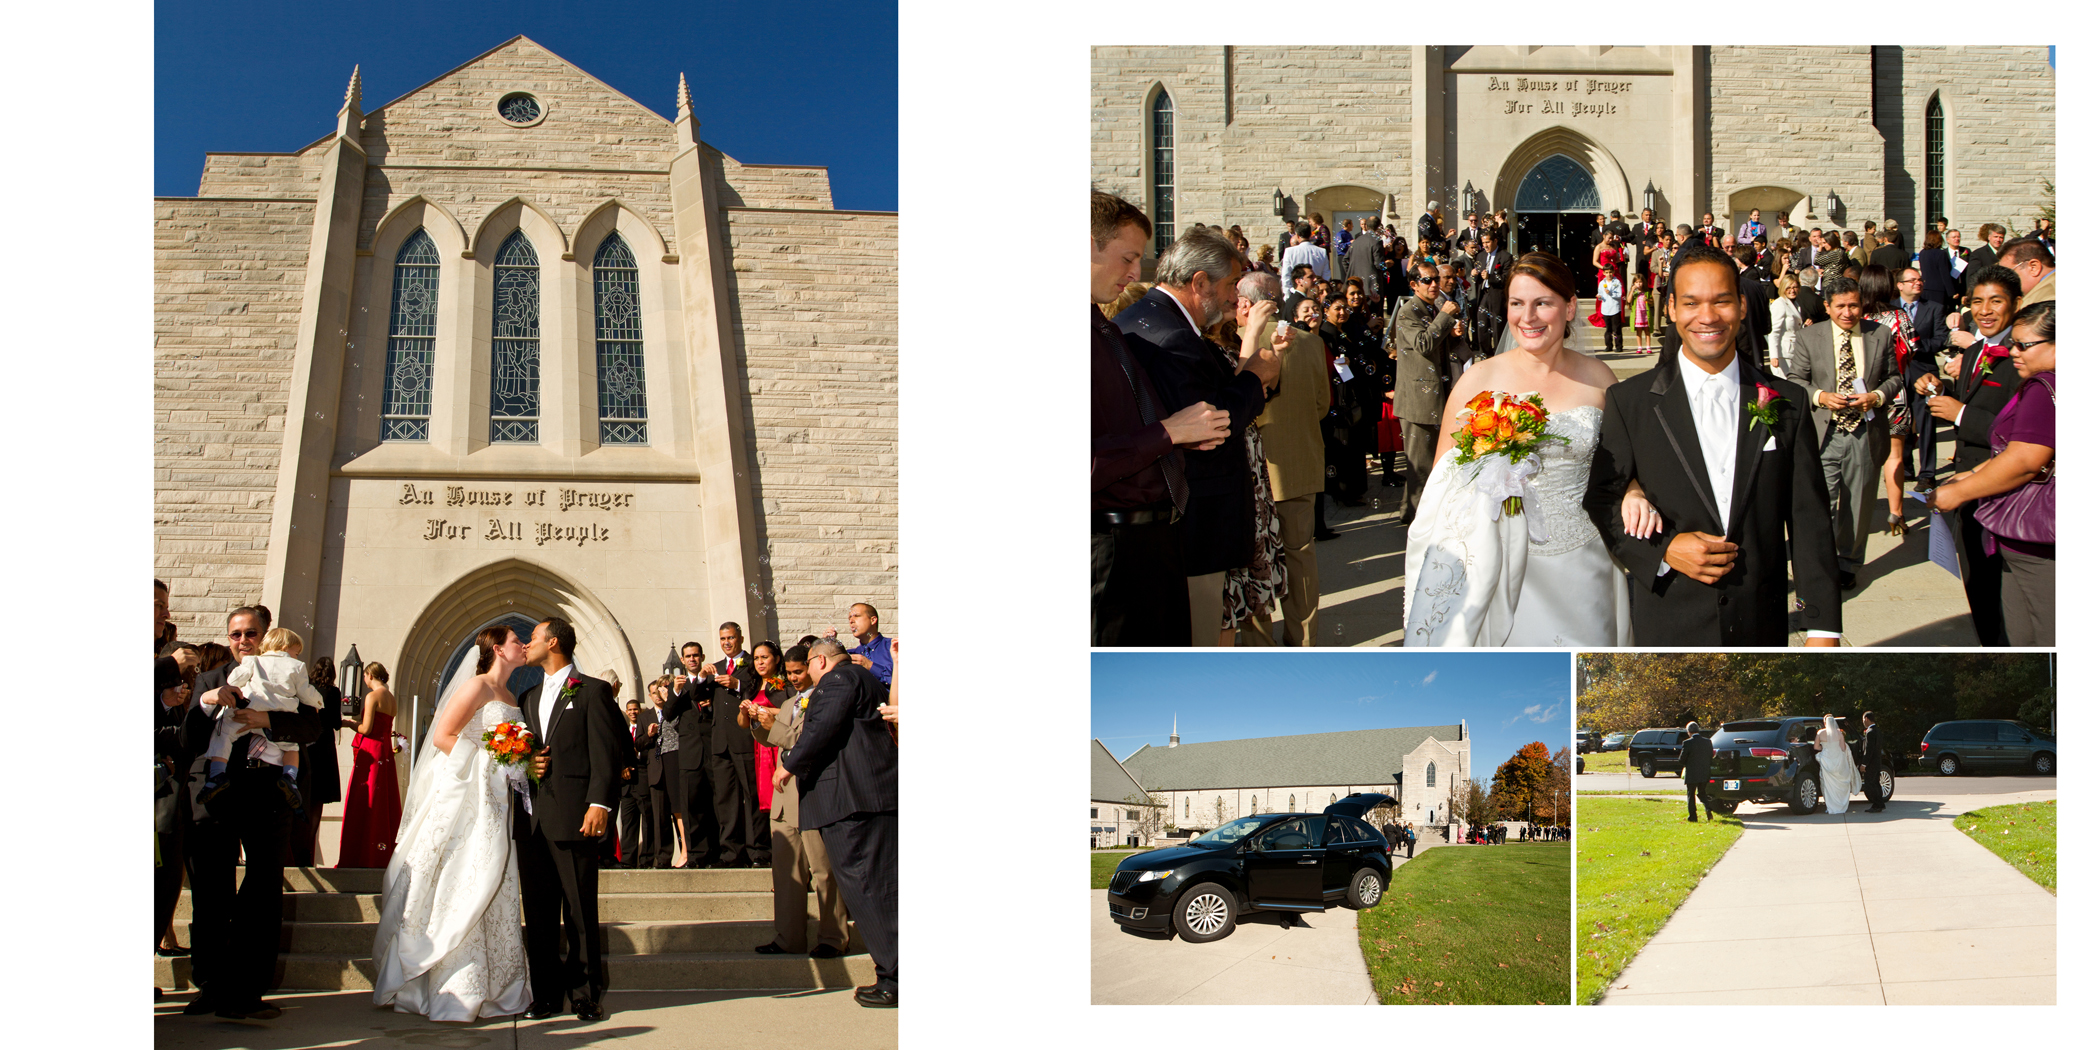 Wedding-Photography-Palaise-Royale-South-Bend-Indiana_21.jpg